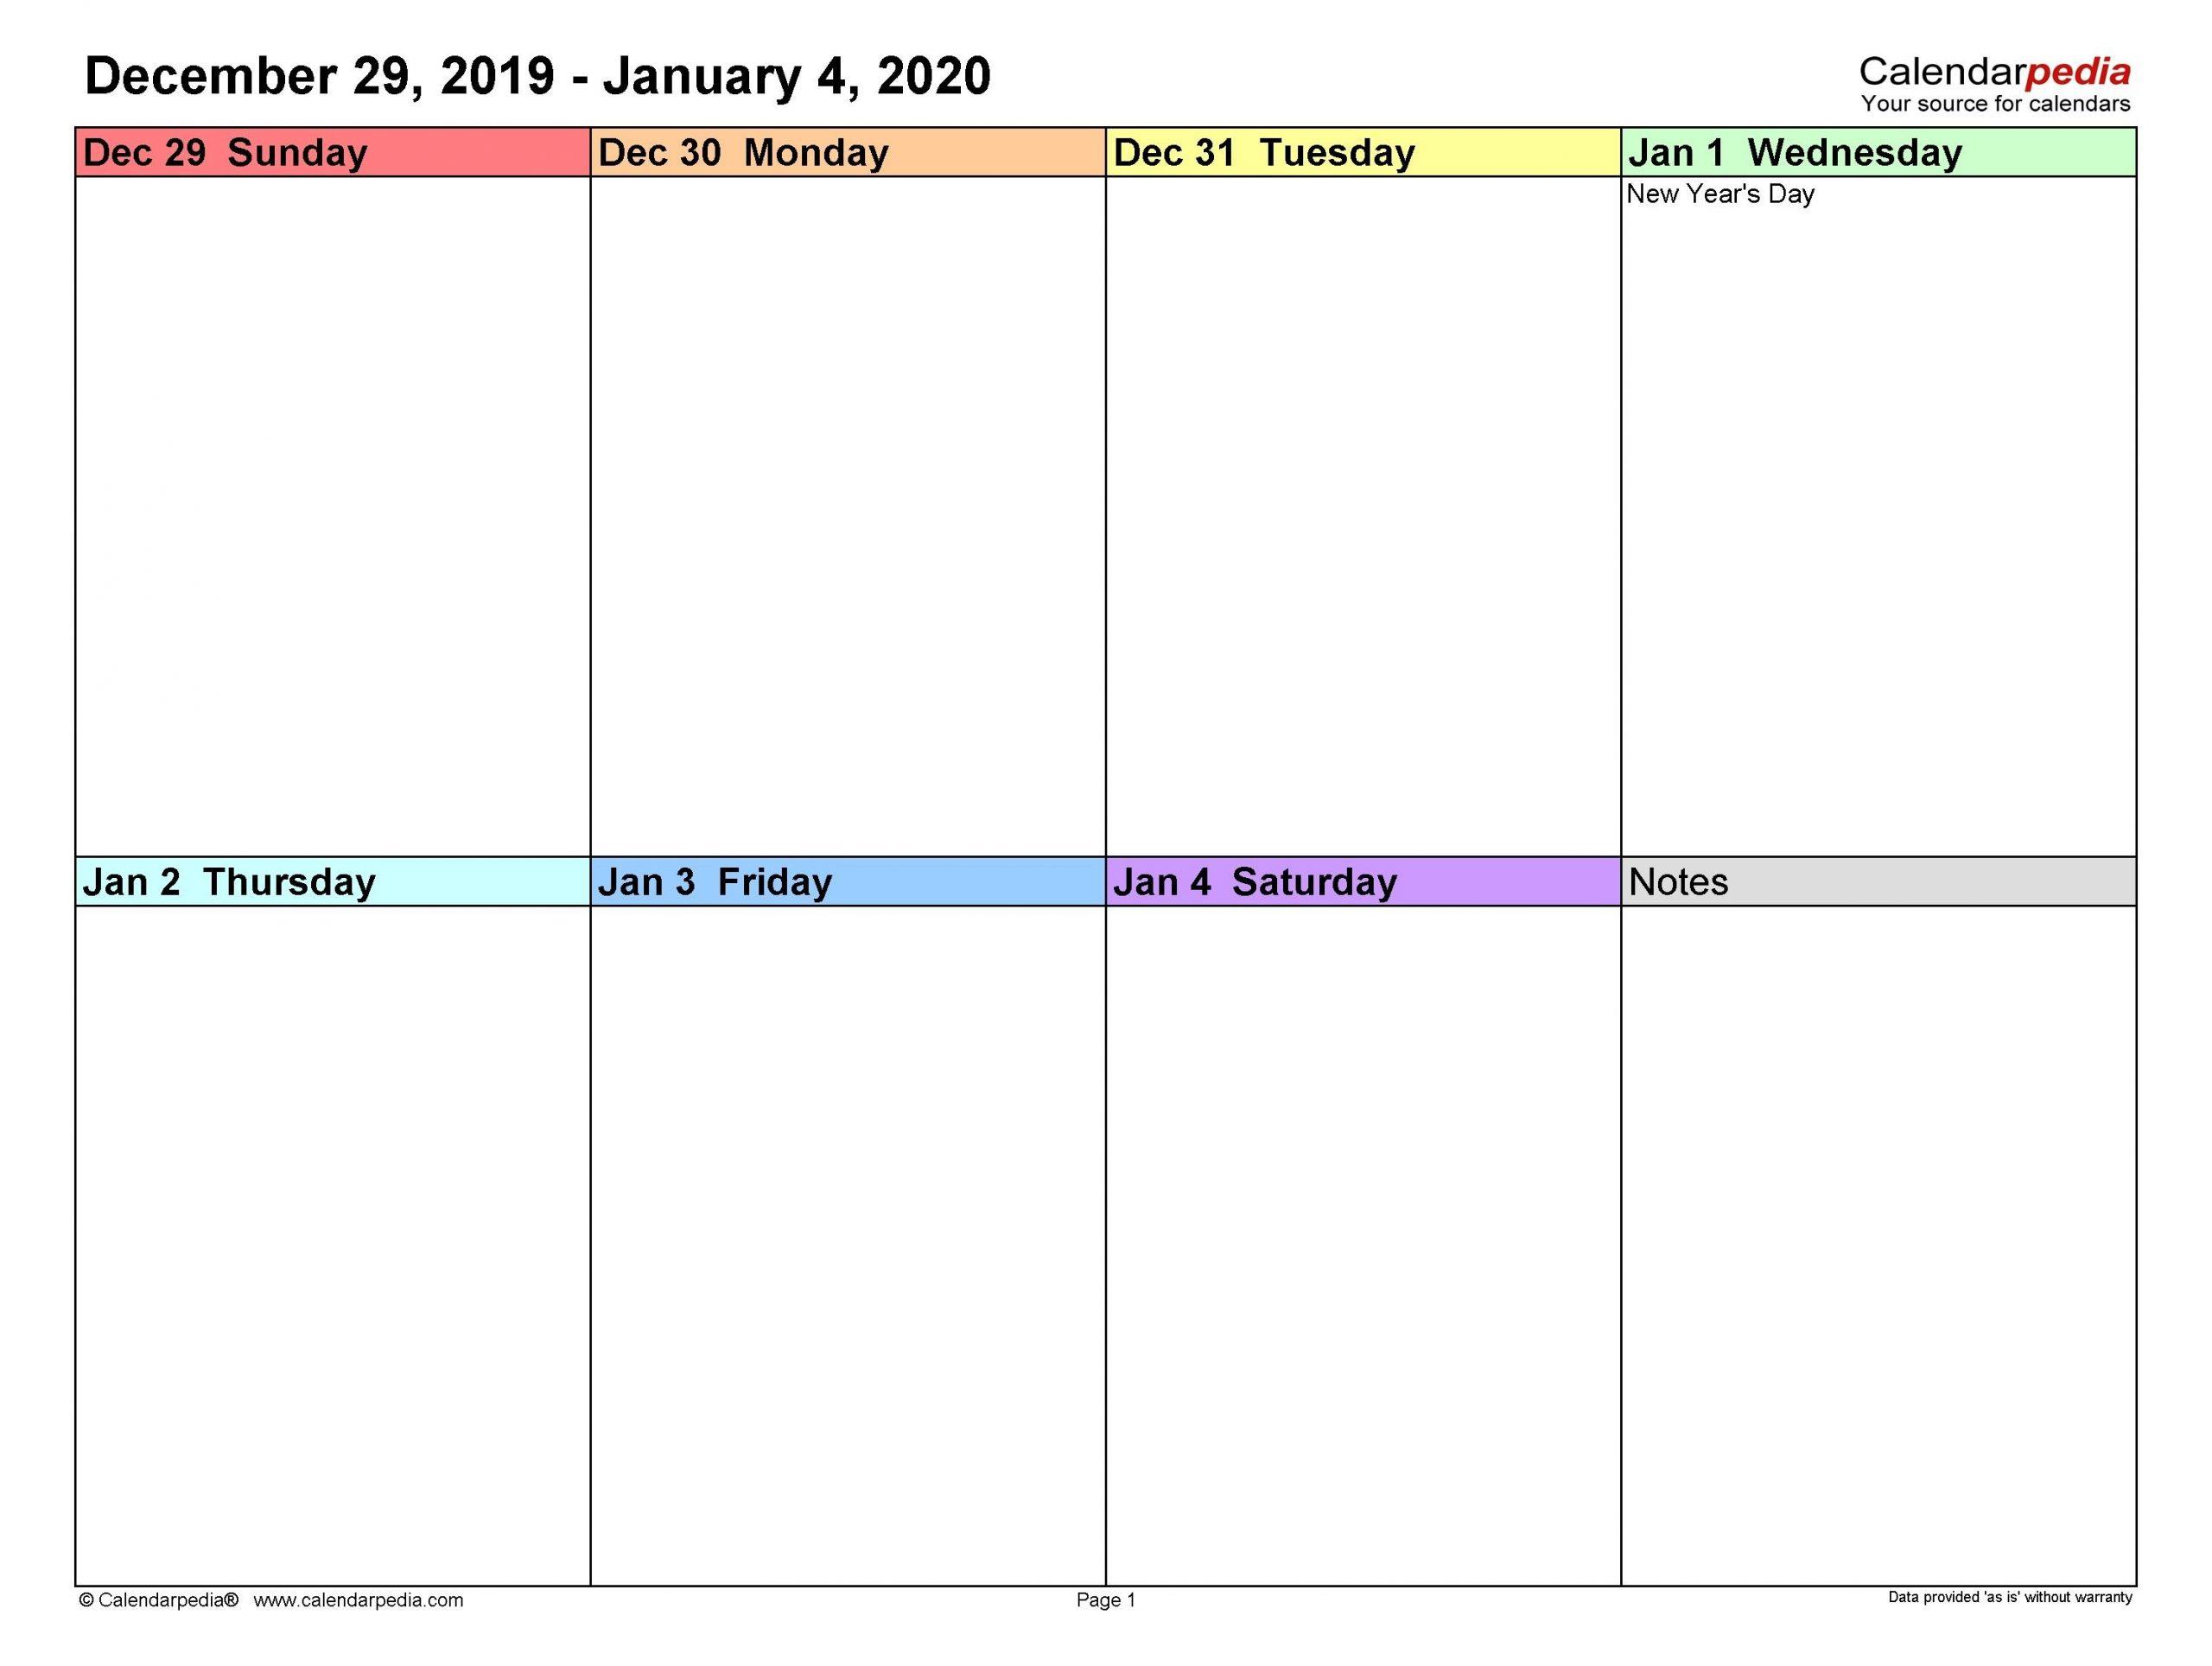 The Editable 2 Week Calendars In 2020 | Free Calendar Free Week Calendar Editable